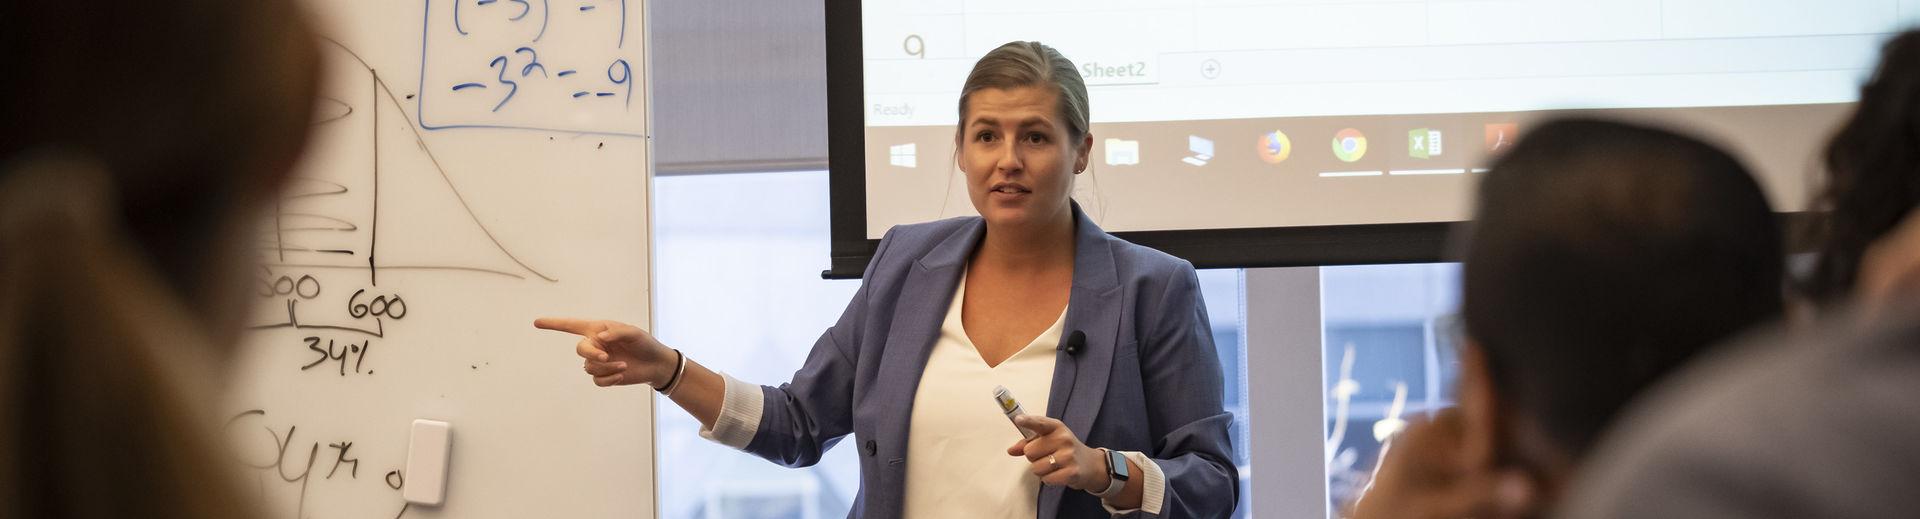 Fox professor instructing her students.